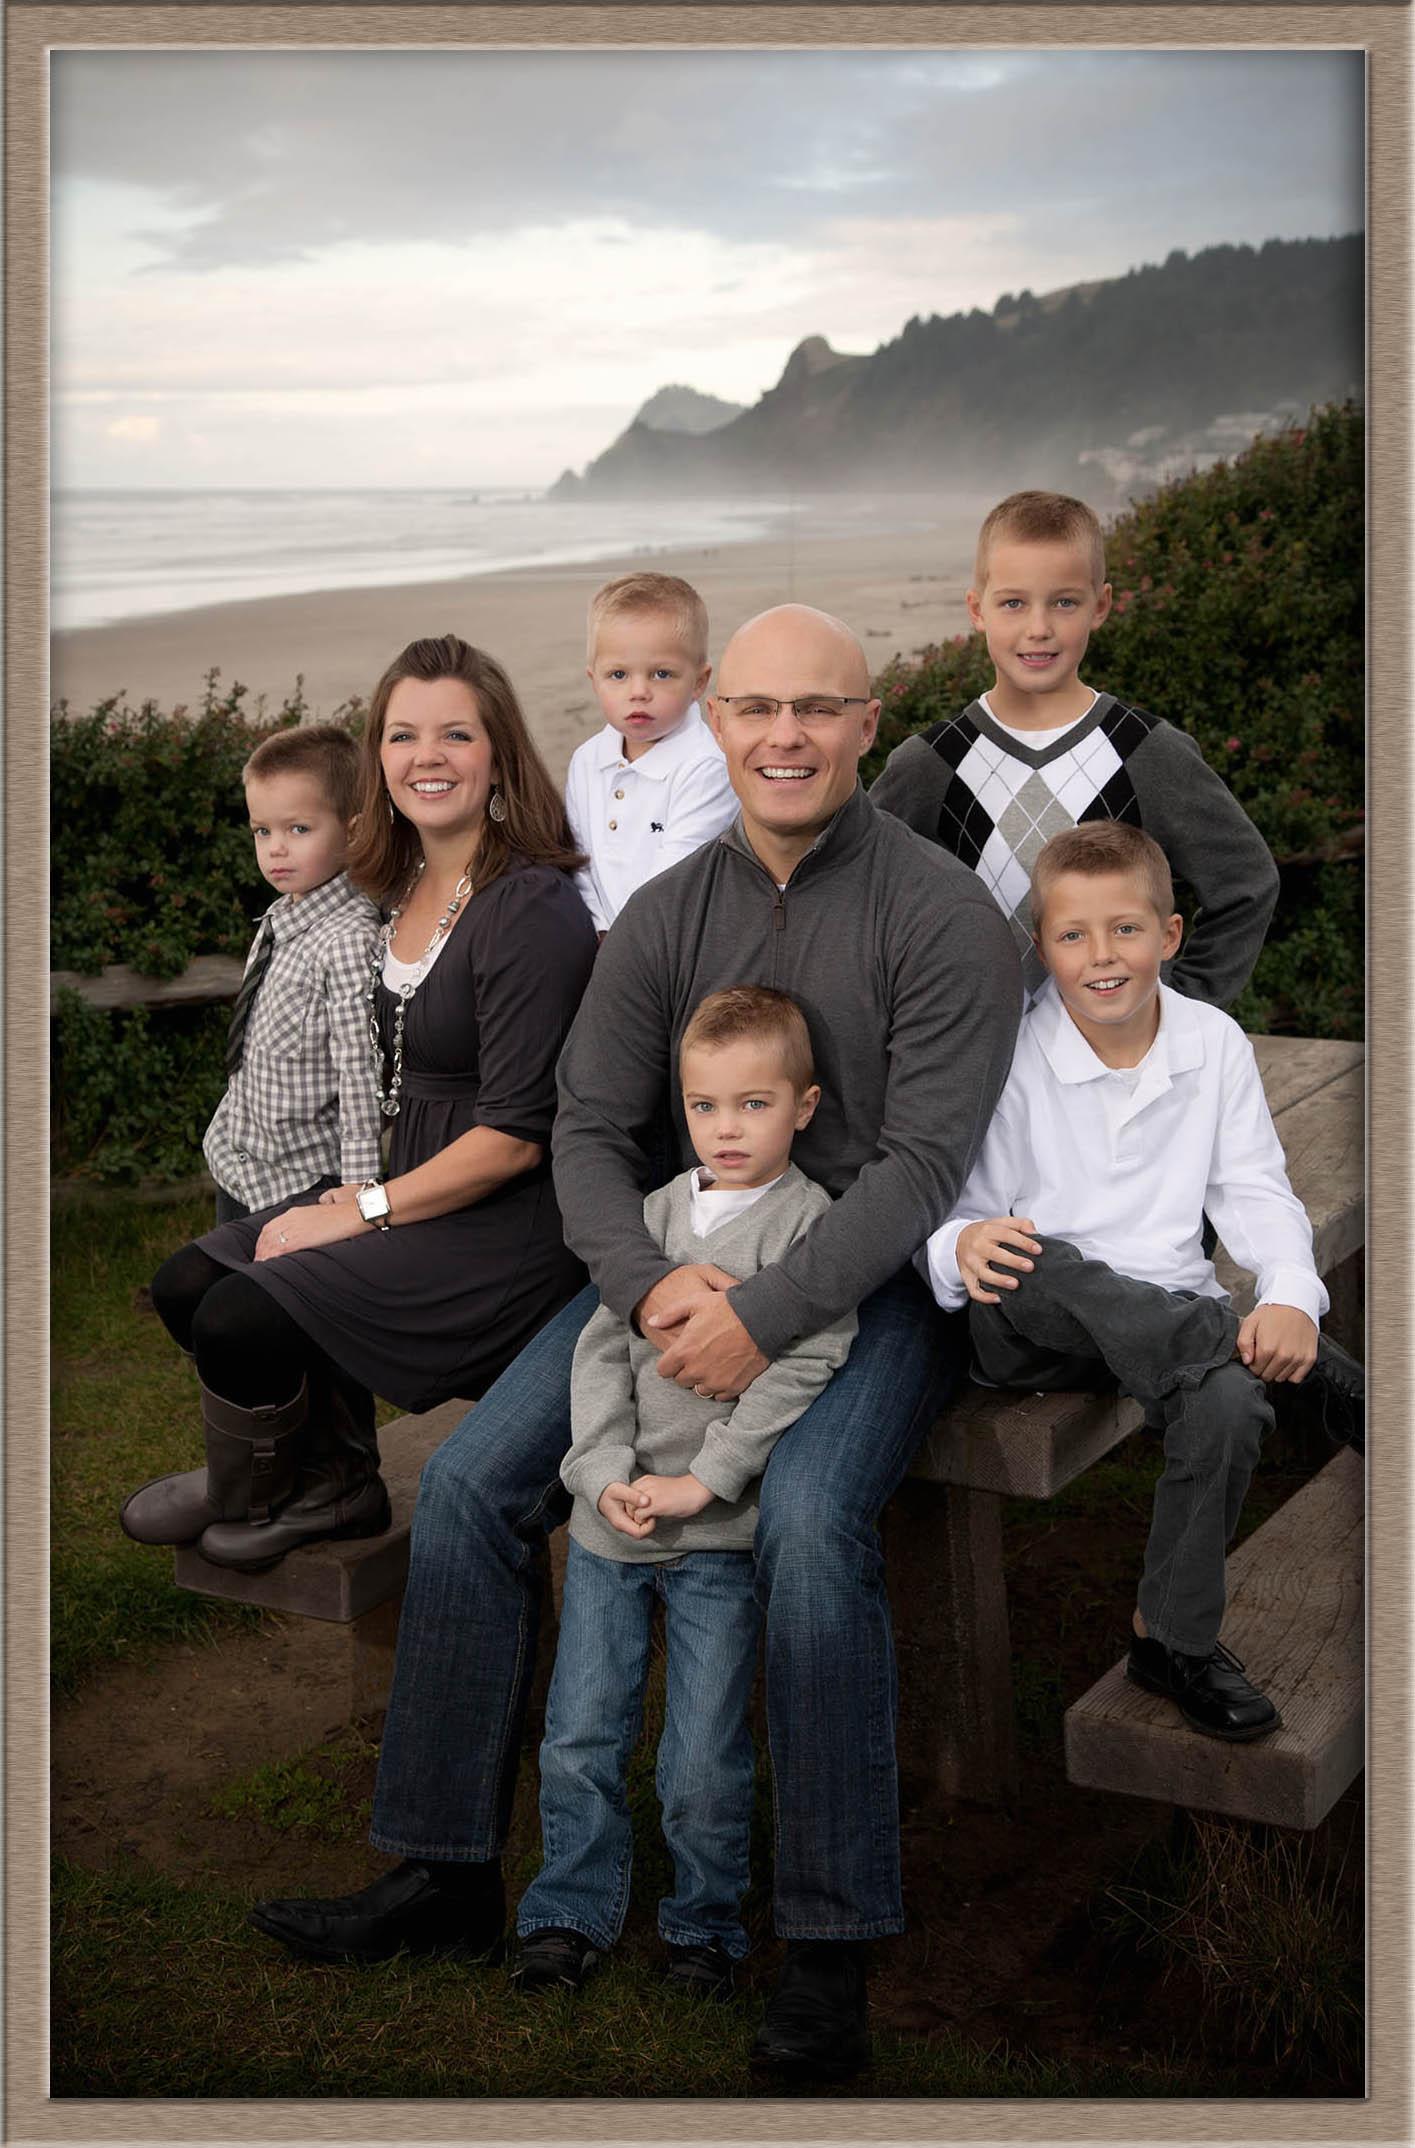 Family Outdoor – Scott Hancock Photography |Outdoor Family Photography